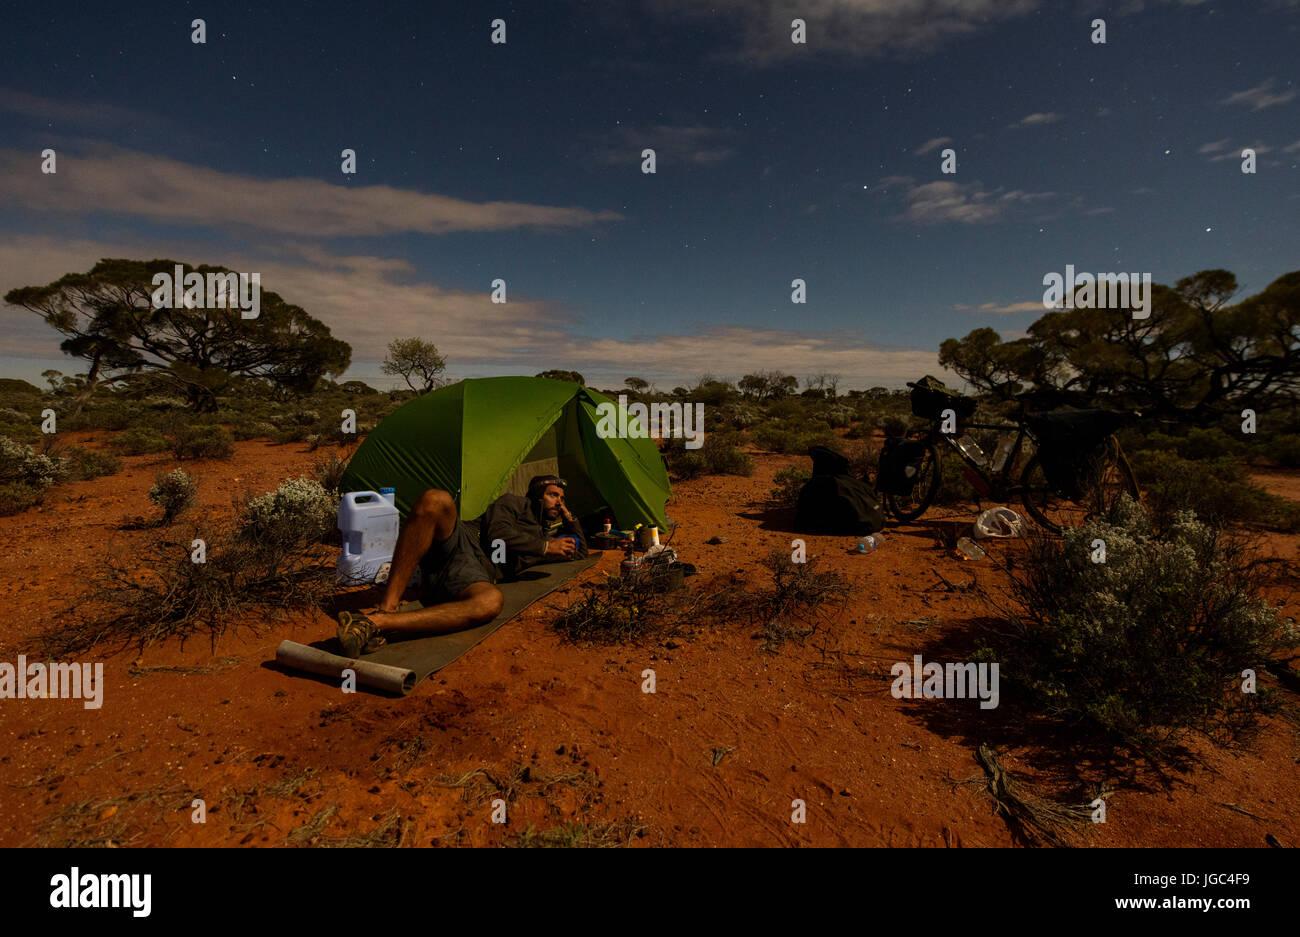 Camping in Australia - Stock Image